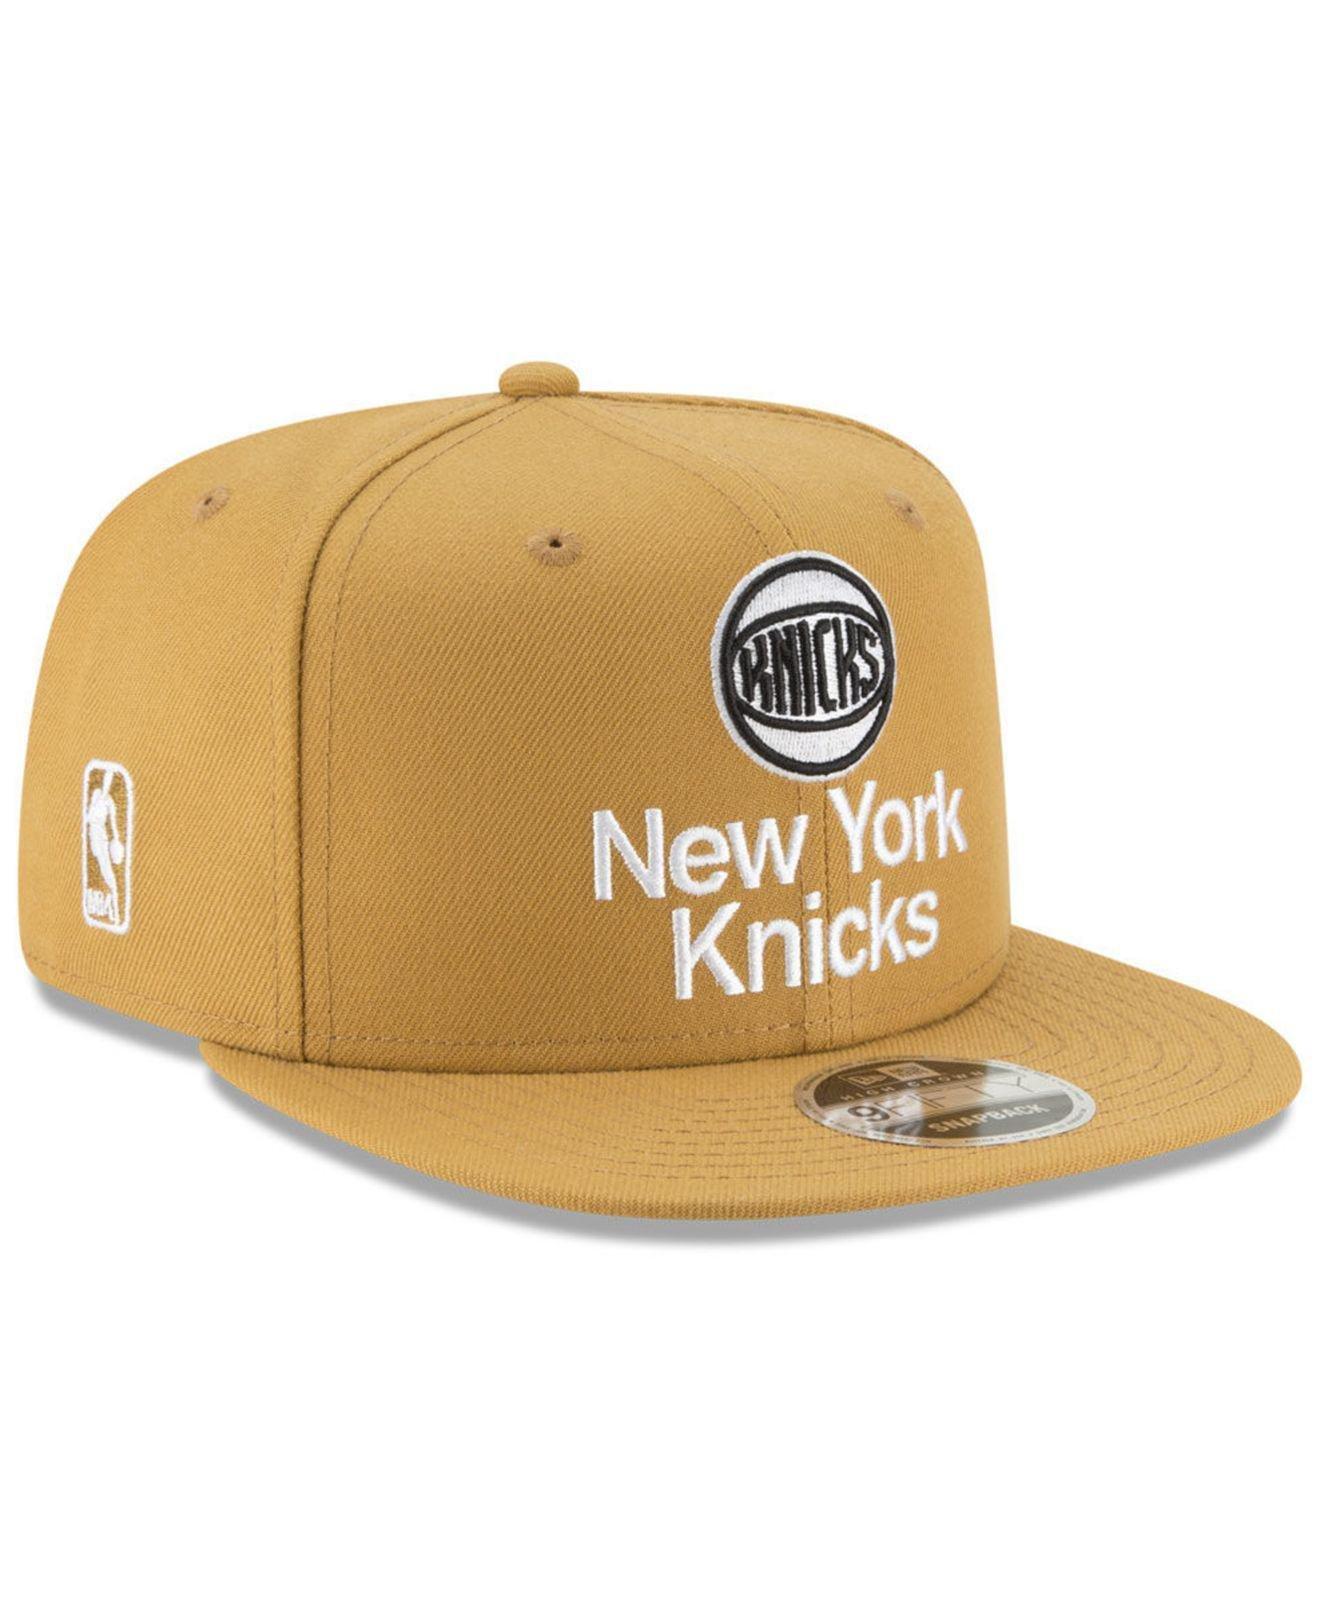 best website 93d72 4ed1b ... wholesale new york knicks retro basic 9fifty snapback cap for men lyst.  view fullscreen f346e